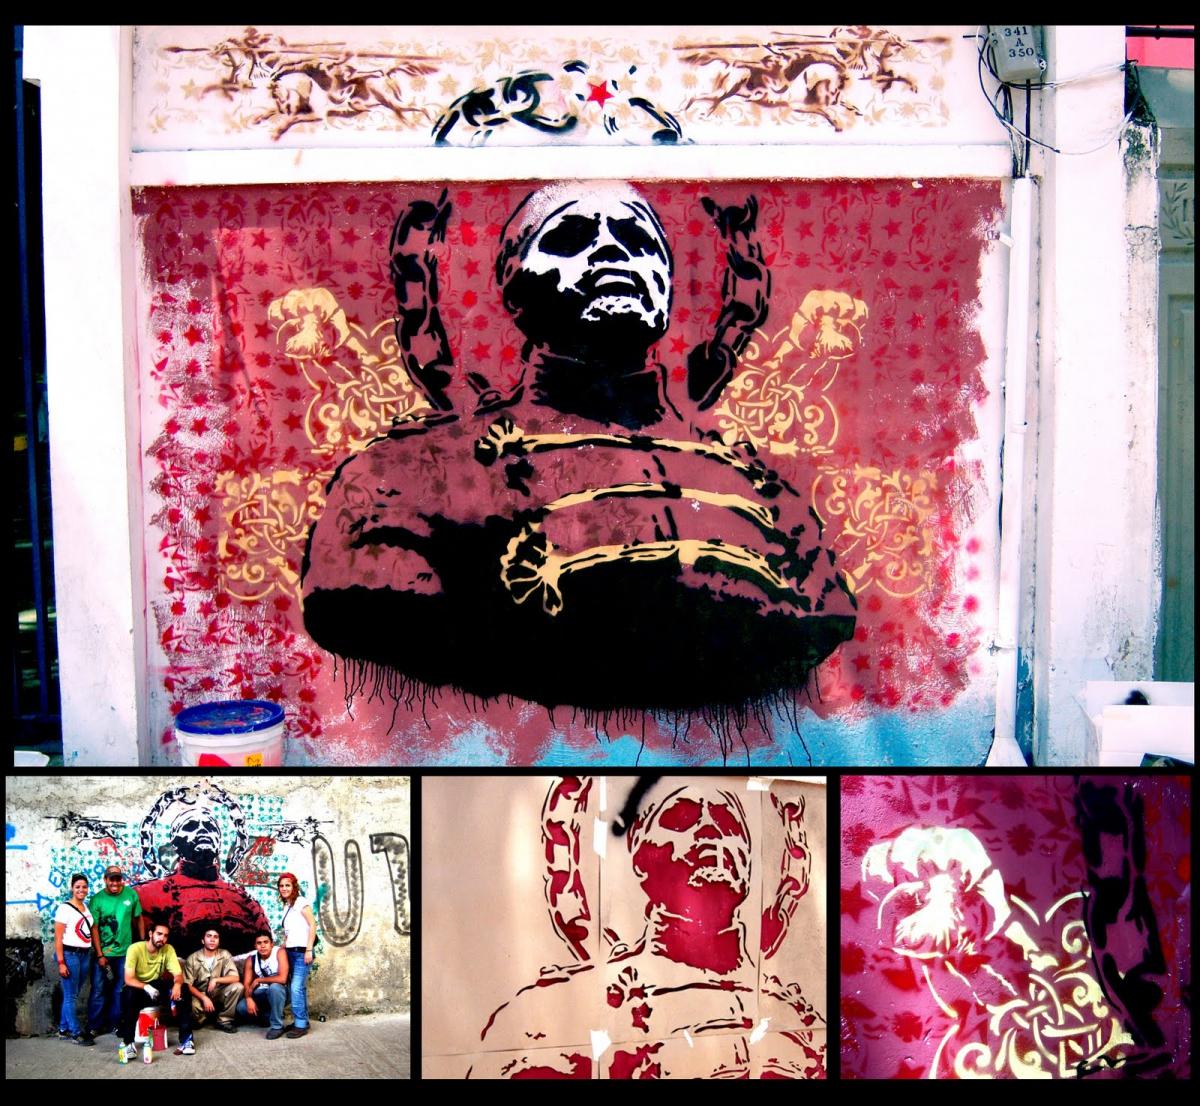 Negro Primero, Venezuelan hero of popular struggle, depicted in this urban art scene.